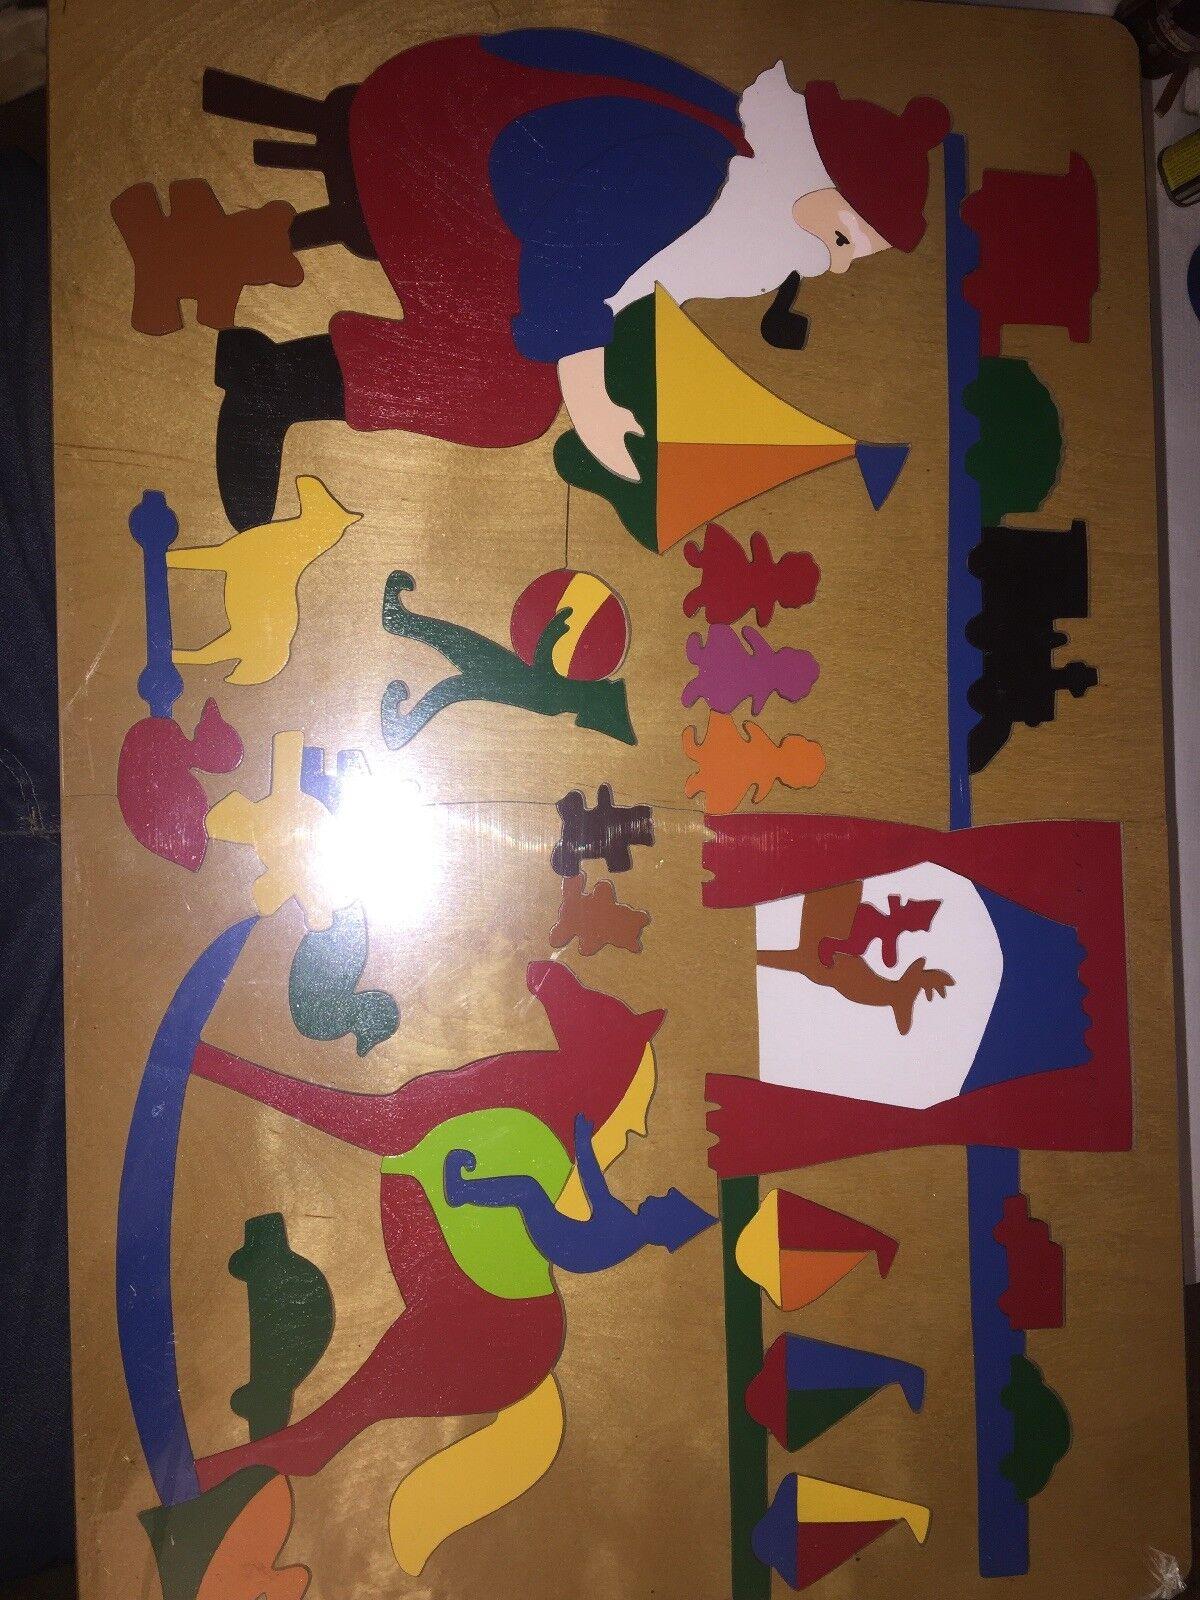 Giant Santas Workshop Wood Puzzle 65 Pieces Folk Art 16x24 Hand Cut And Painted